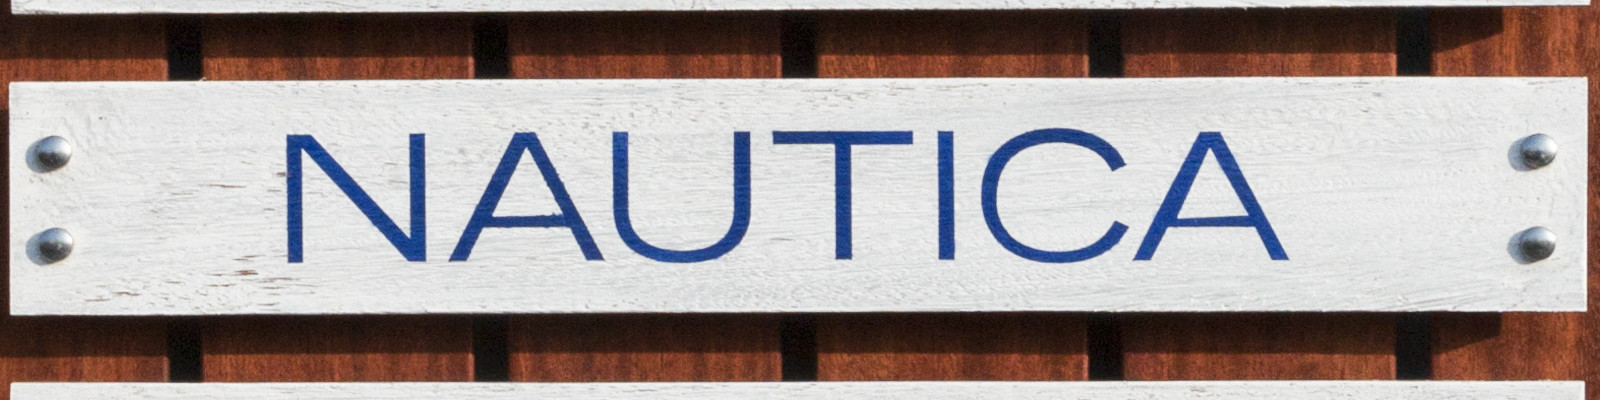 Nautica street sign